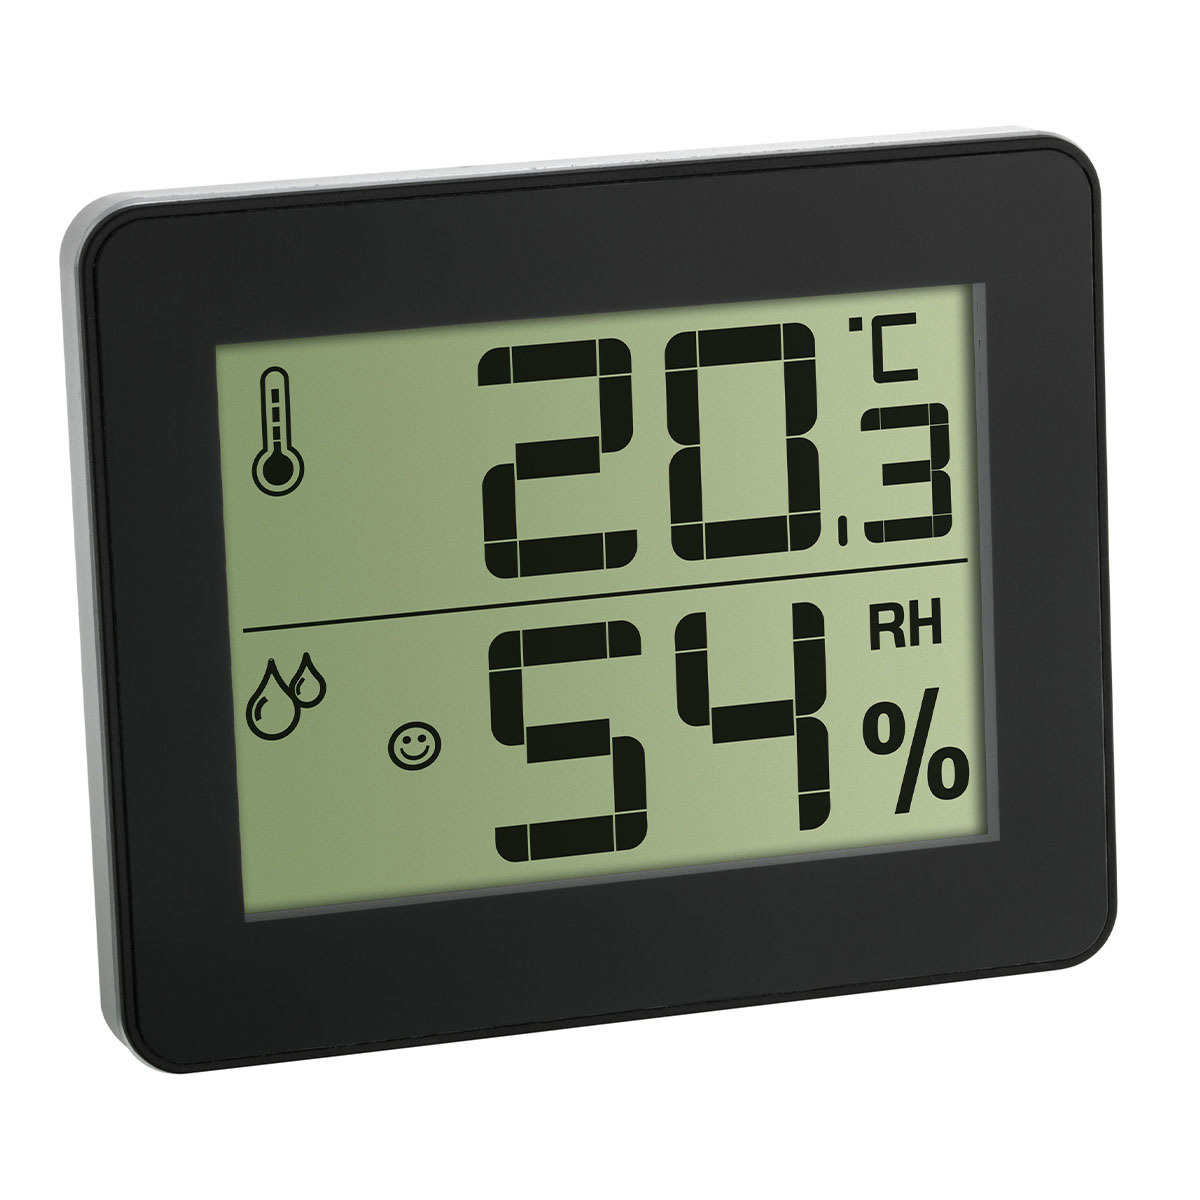 30-5027-01-digitales-thermo-hygrometer-1200x1200px.jpg